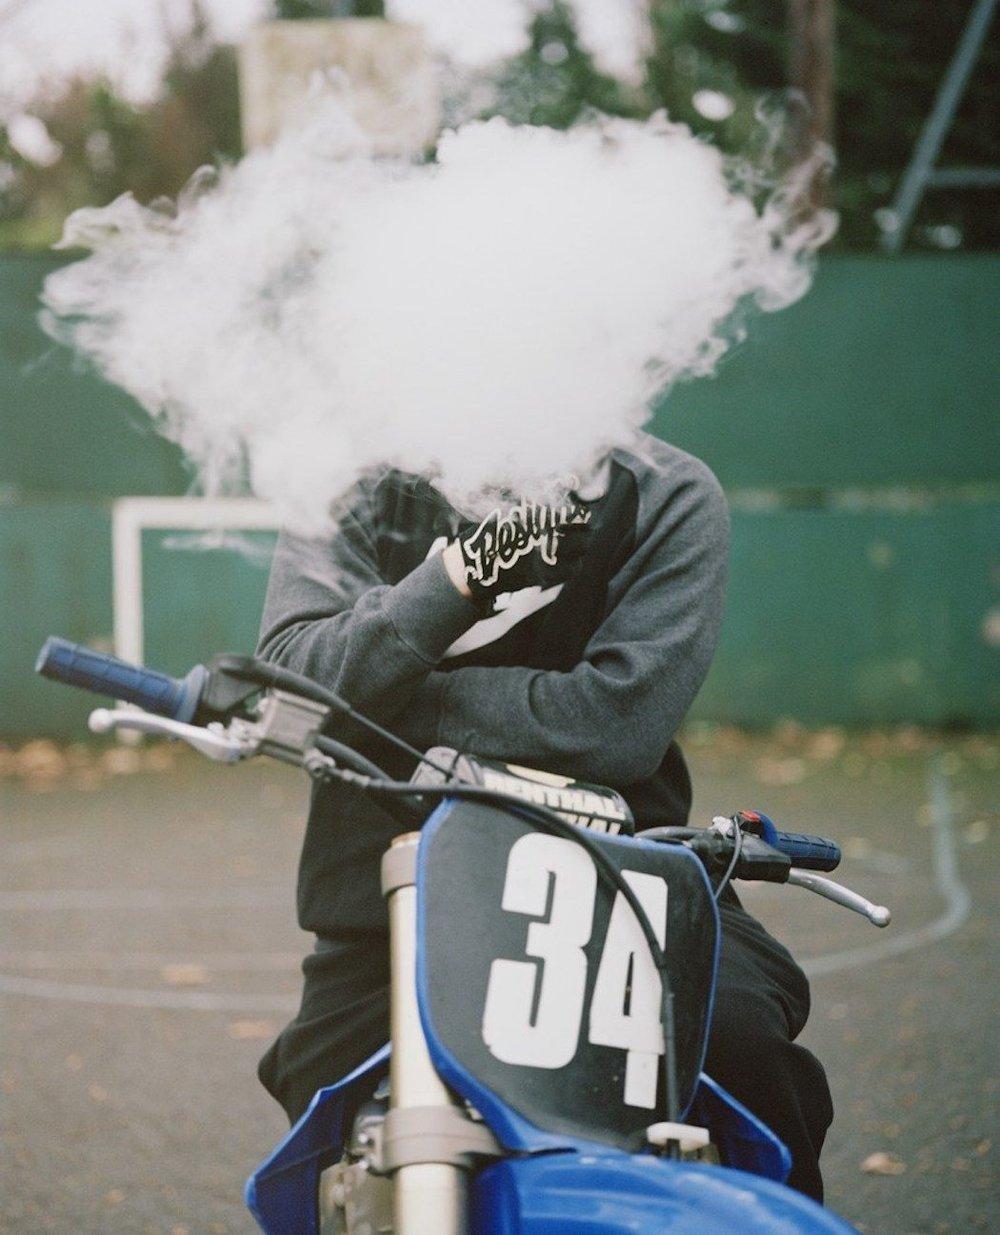 Photography_iGNANT_One_Wheel_Bad_Spencer_Murphy_08-1050x1297.jpg